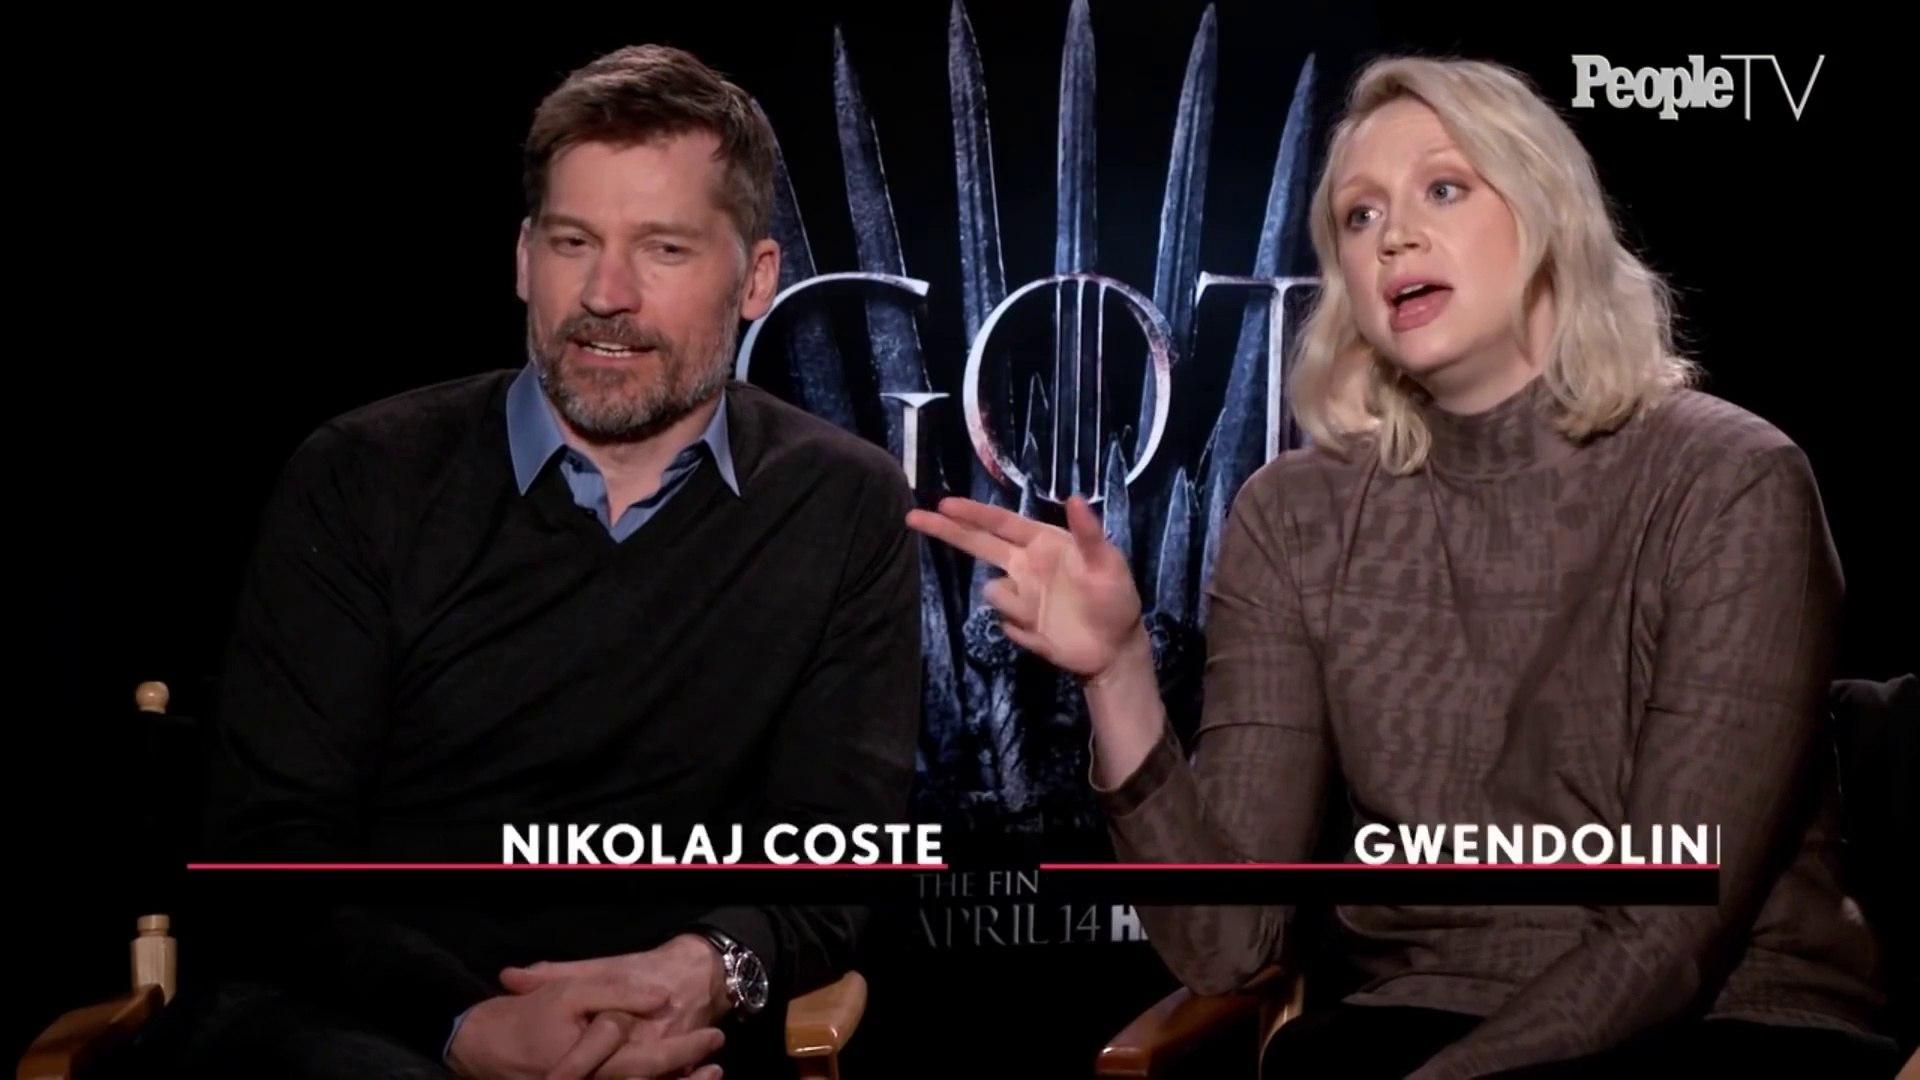 Game Of Thrones- Nikolaj Coster-Waldau & Gwendoline Christie's Relationship - Entertainment